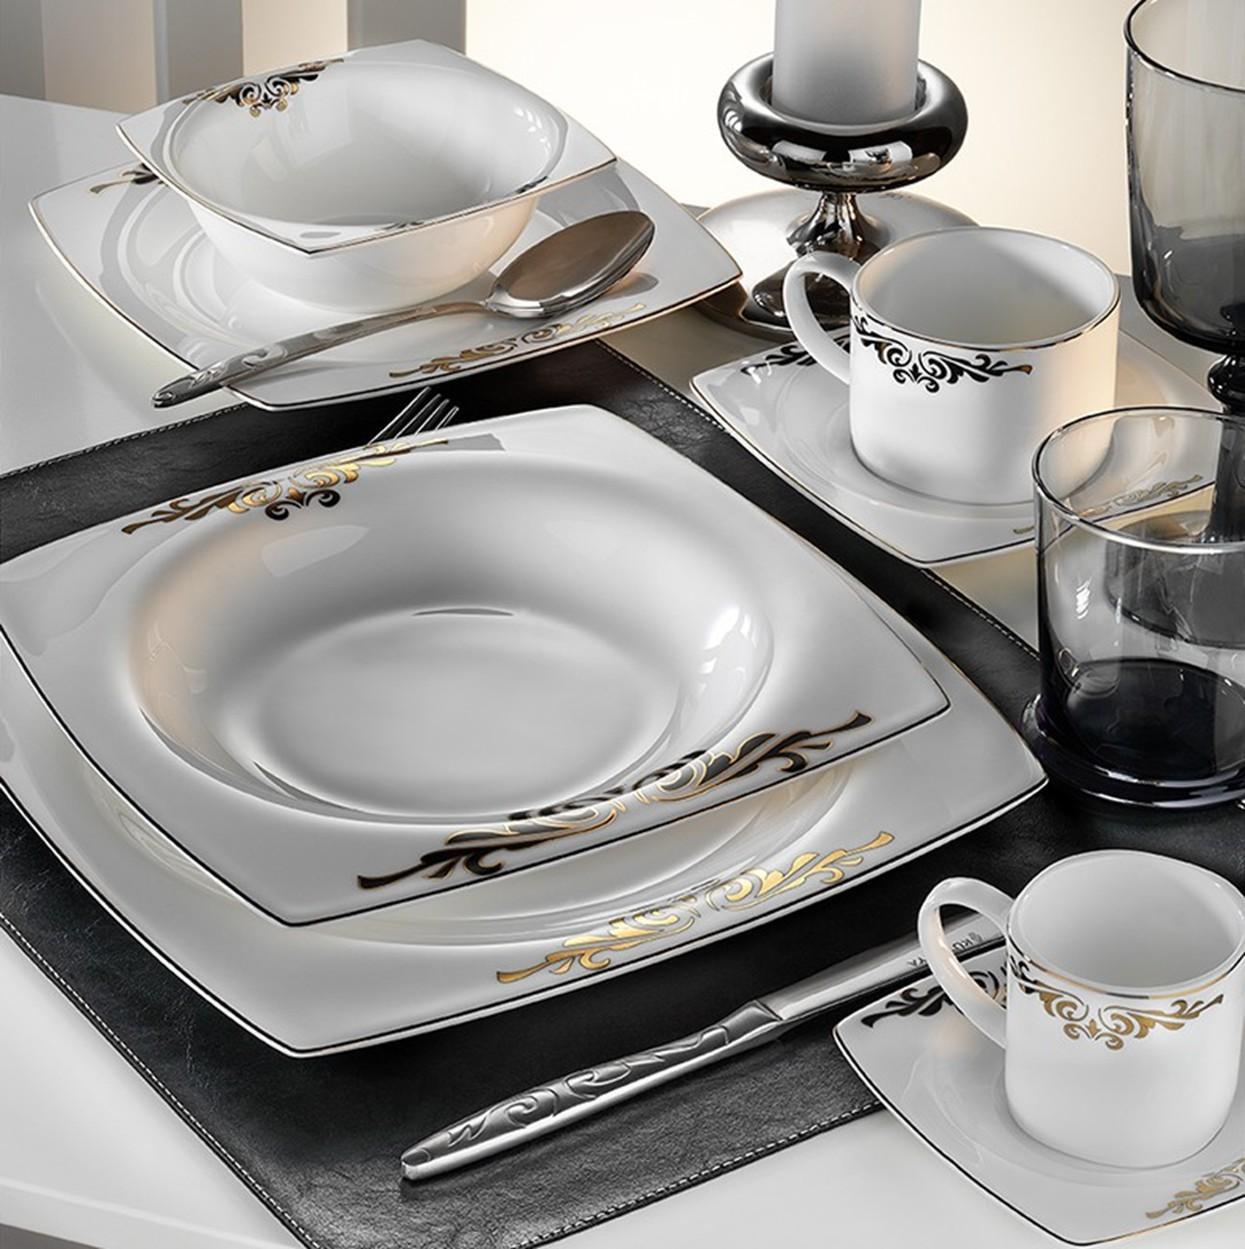 Kutahya Porselen KARE BONE 83 Pieces 60111 Patterned Dinnerware Set